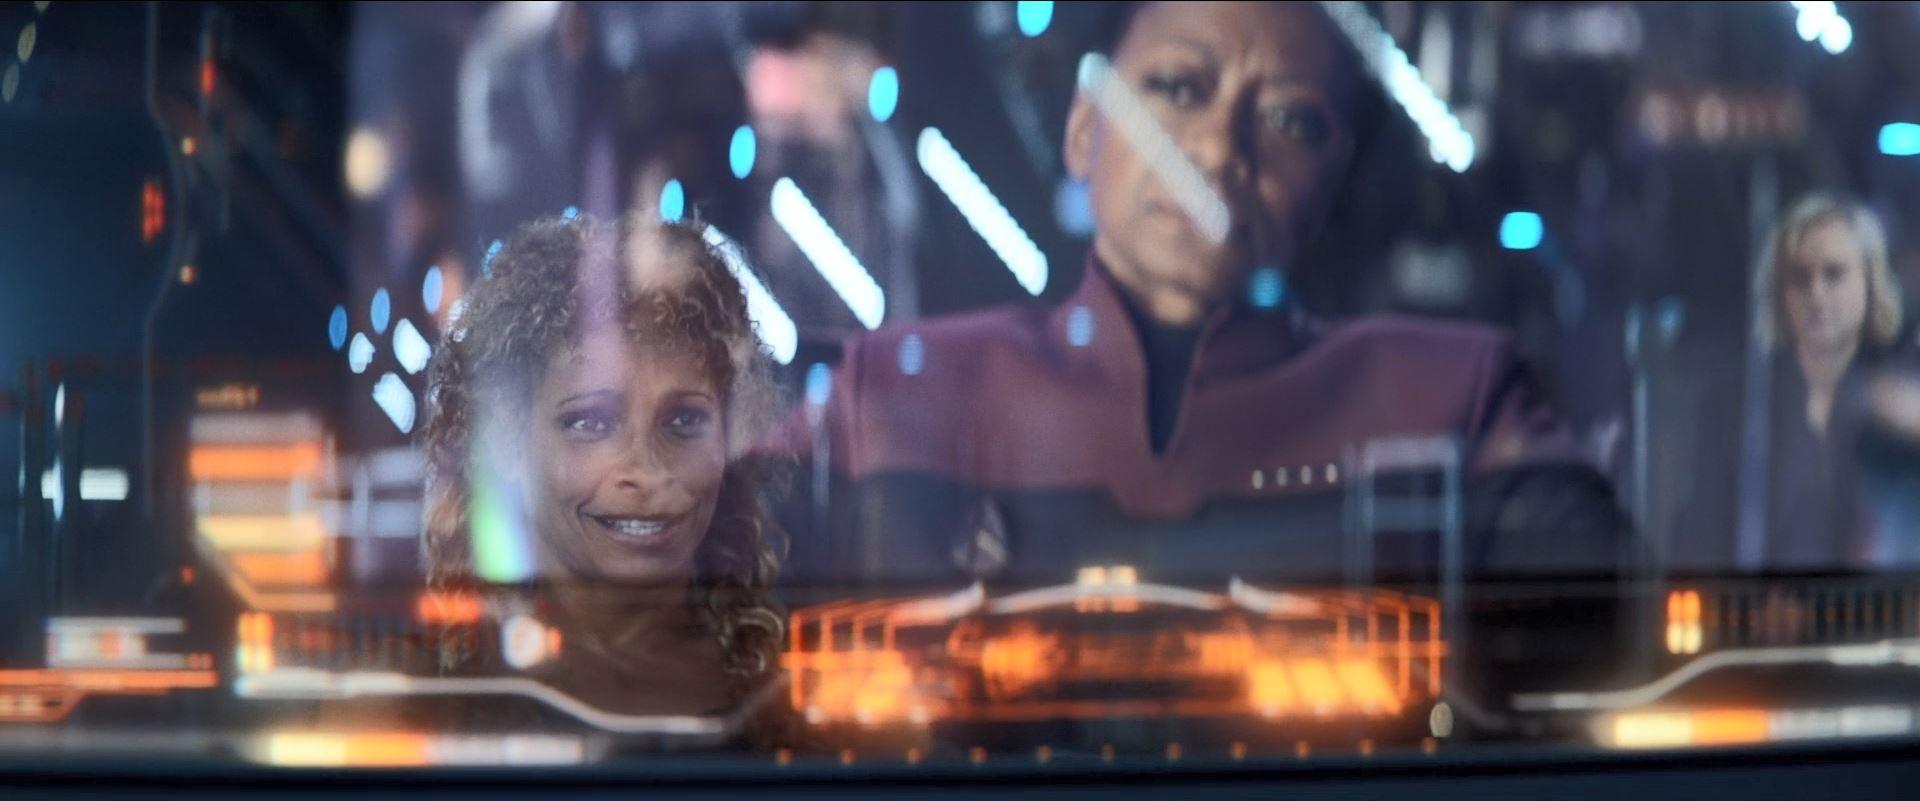 Star Trek Picard S01E06 Review - Rafi obtaining credentials